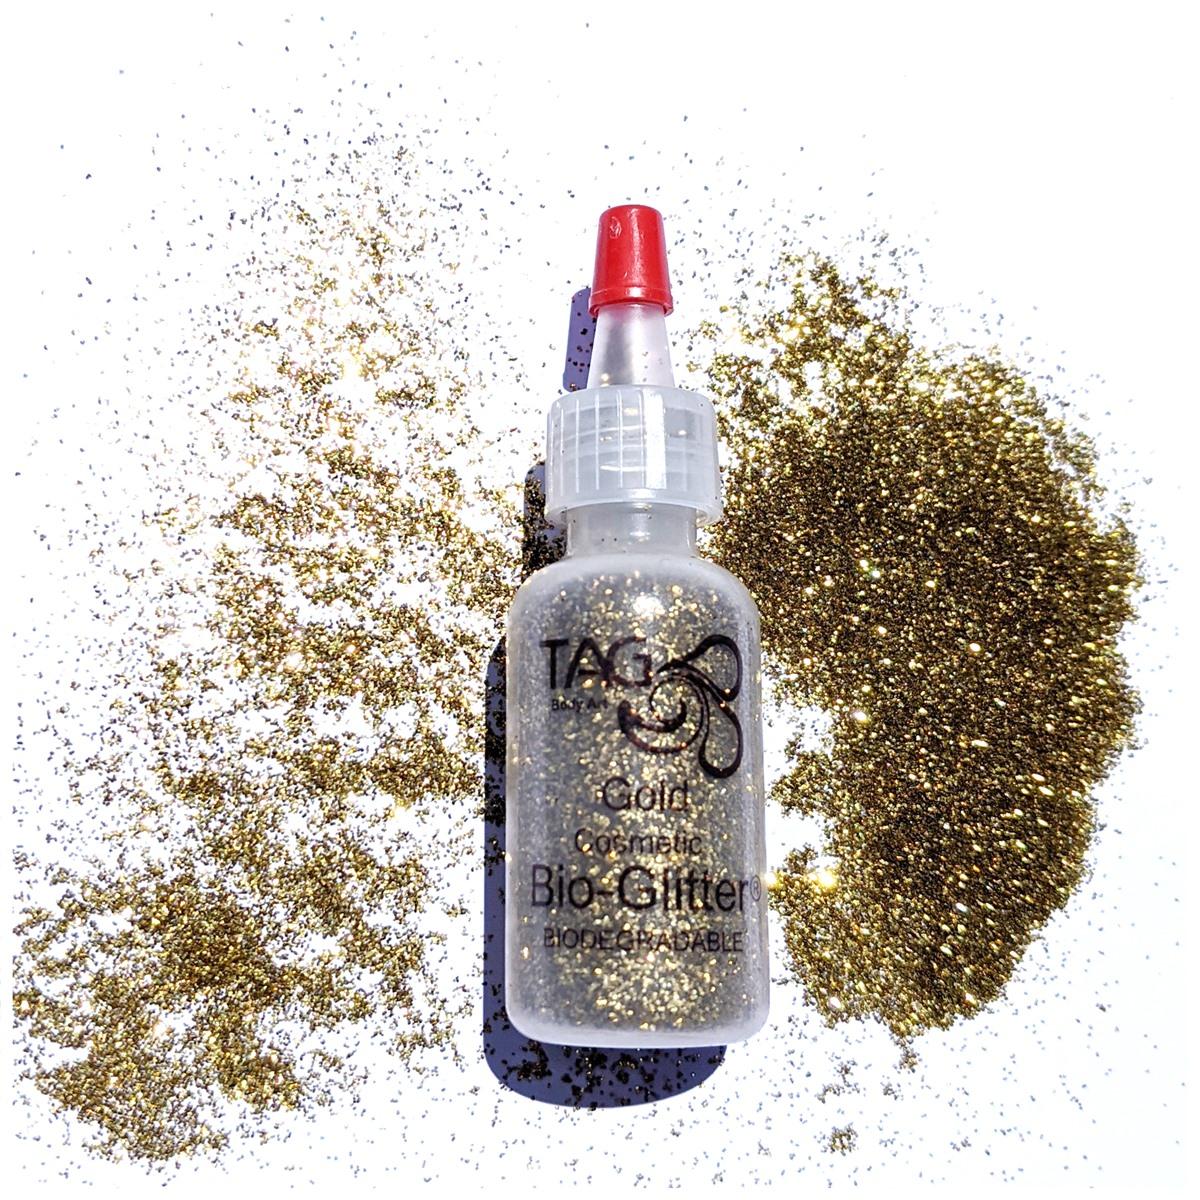 TAG Fine Cosmetic BIO-Glitter 15ml Puffer Bottle – Gold